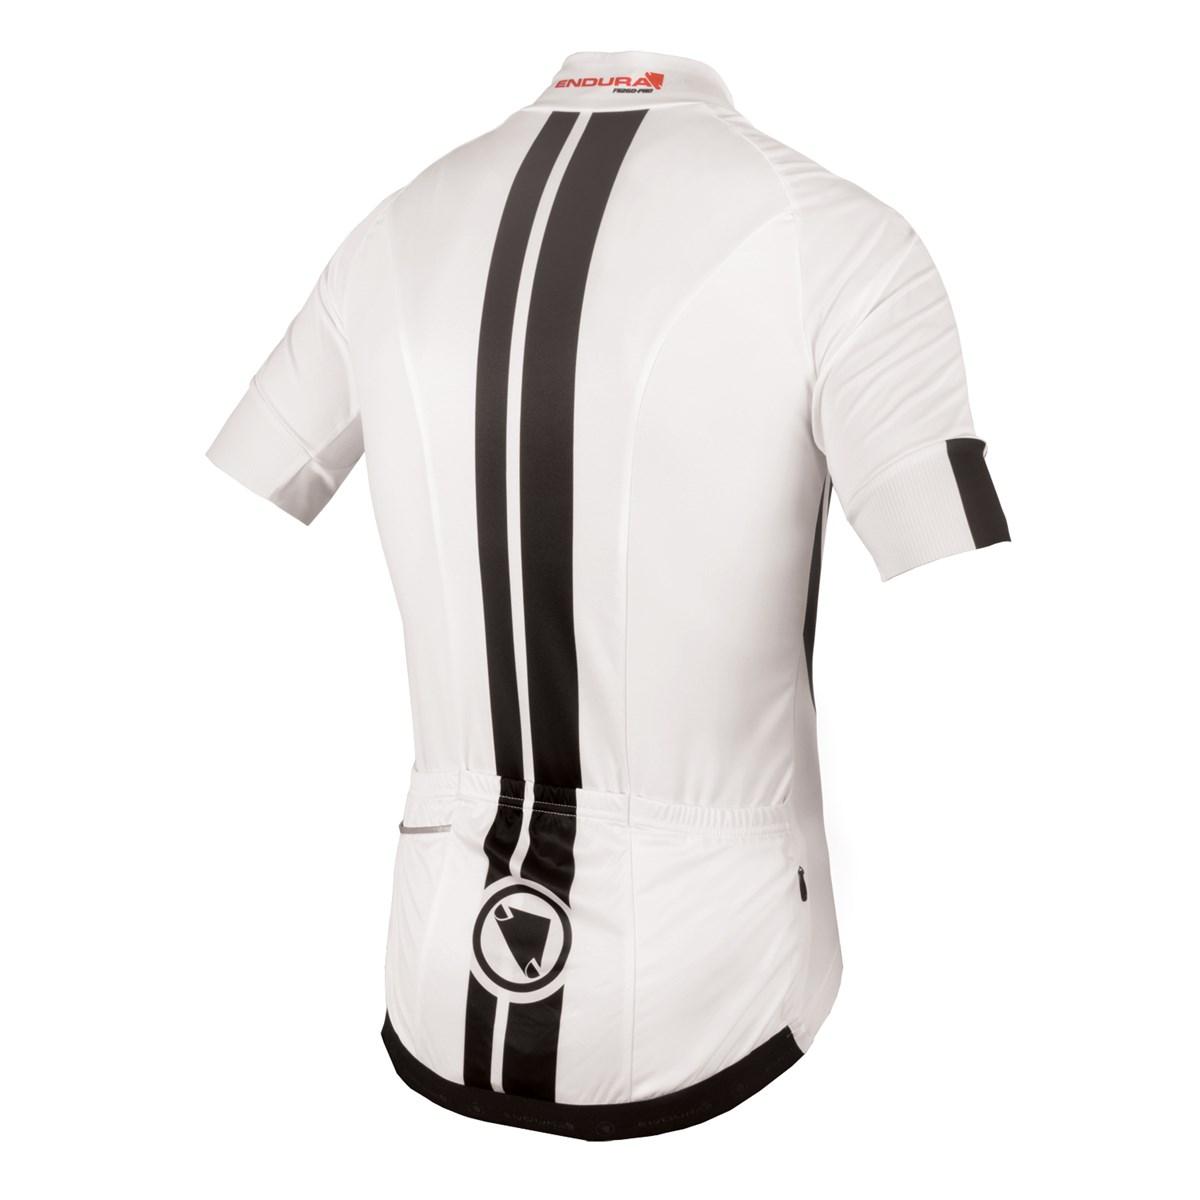 Endura FS260-Pro Jetstream White Short Sleeve Cycling Jersey £77.99 bc64f4b6d